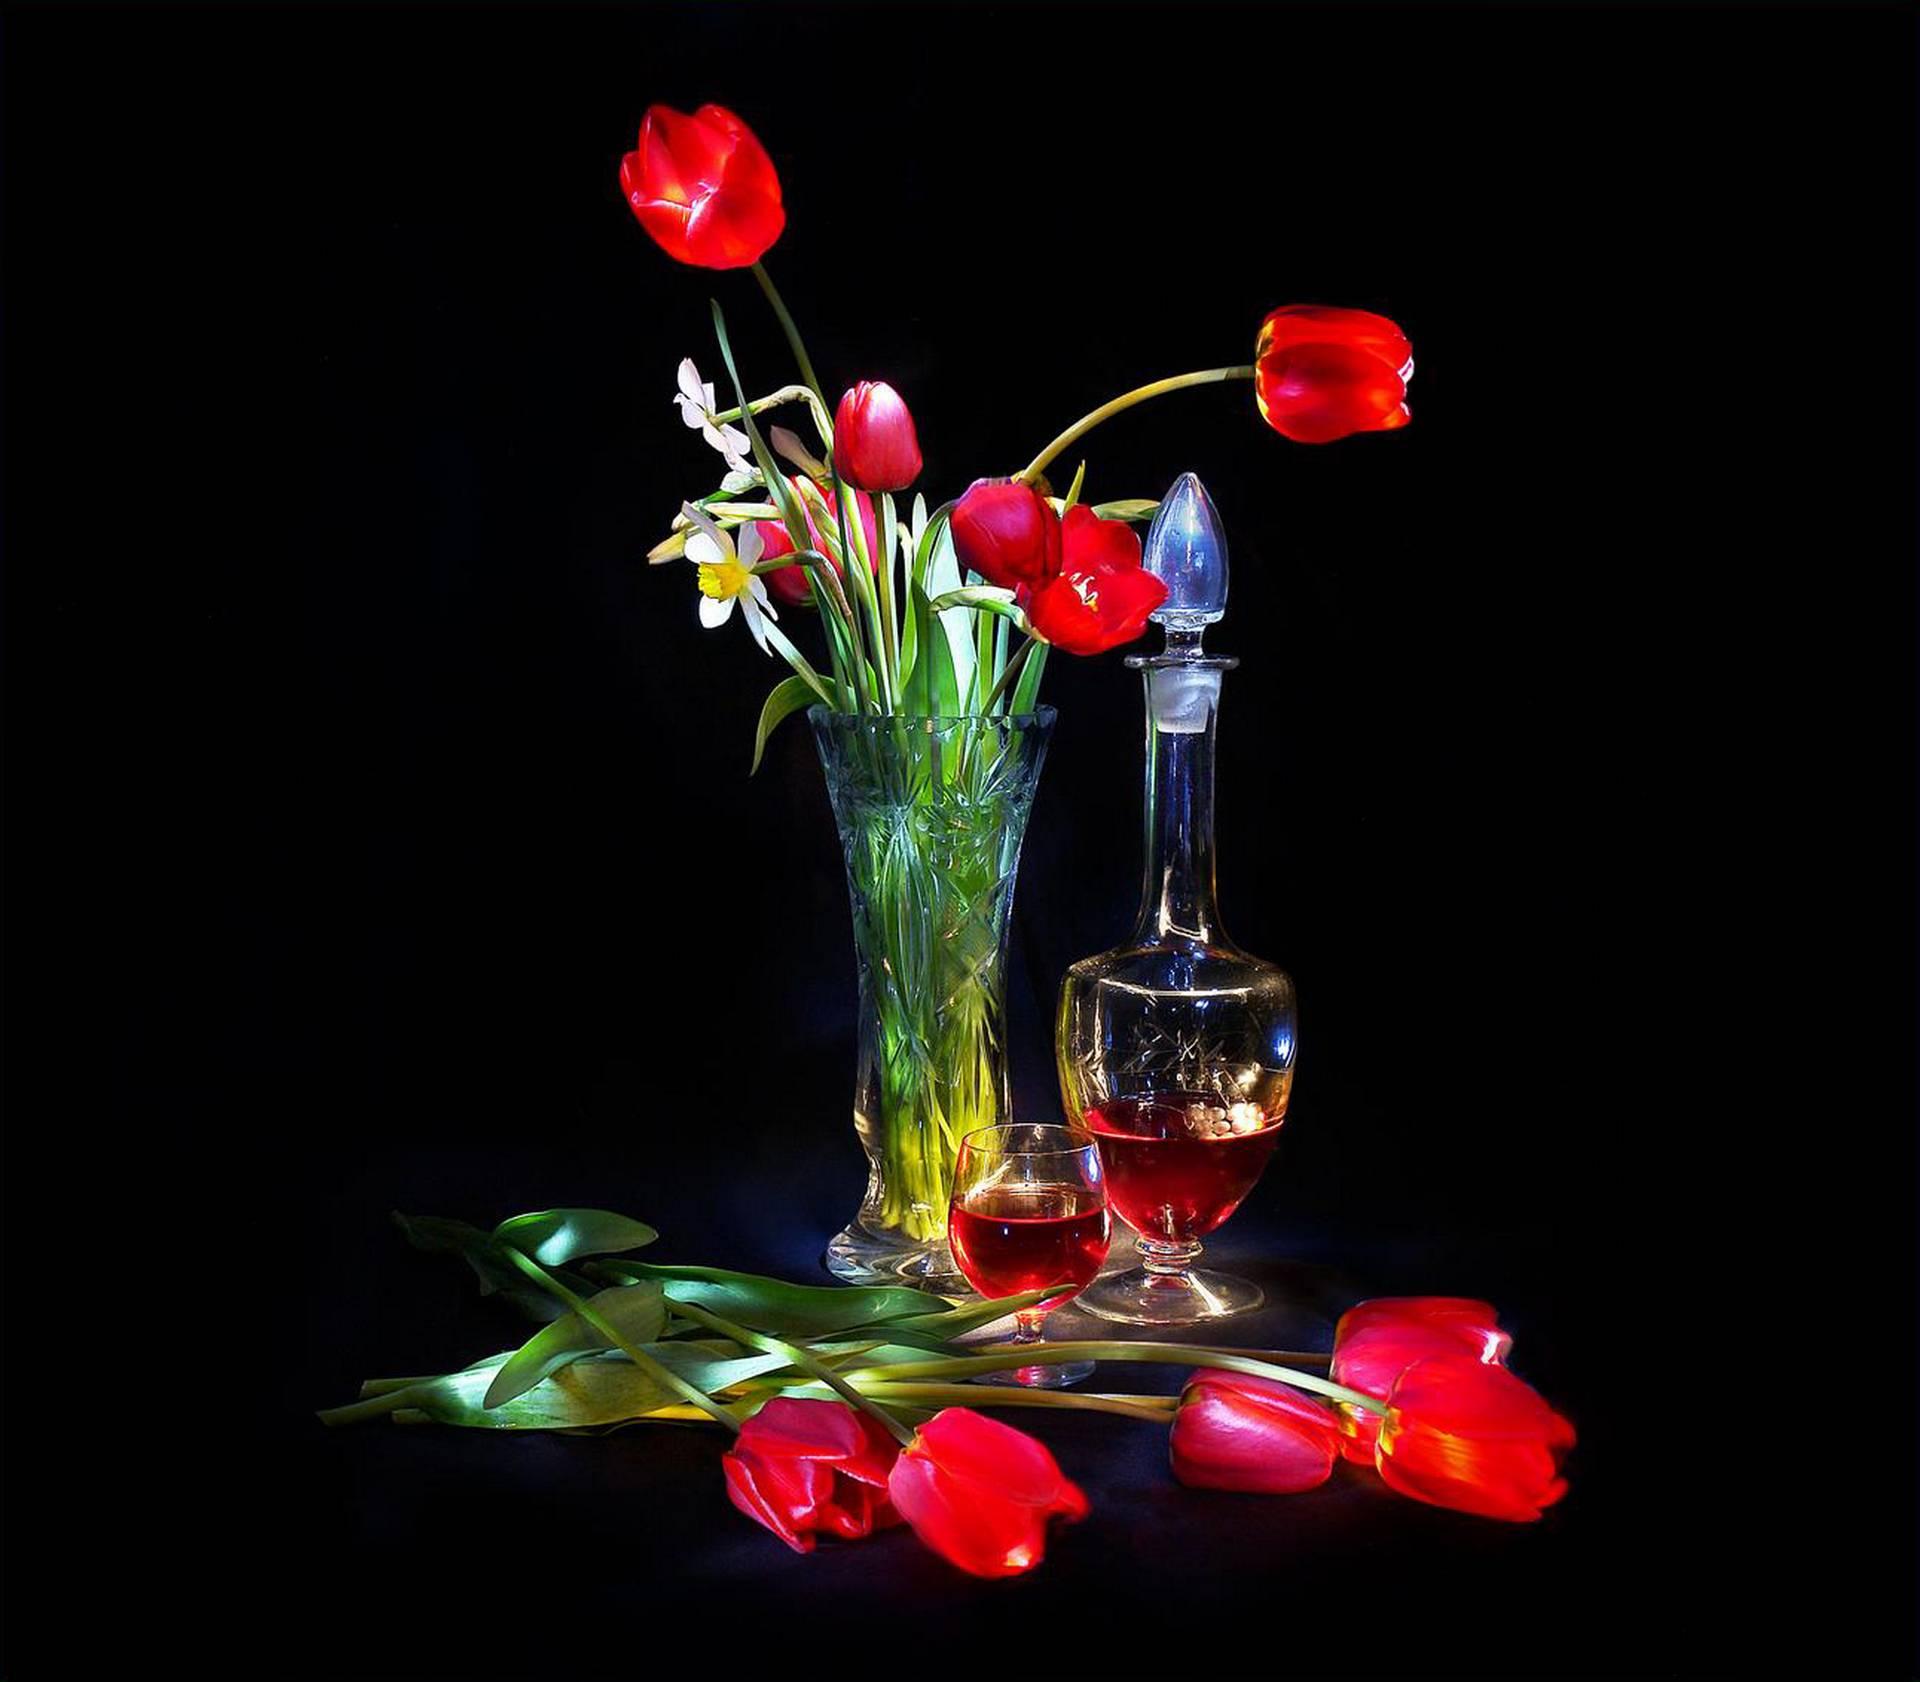 May. Tulips